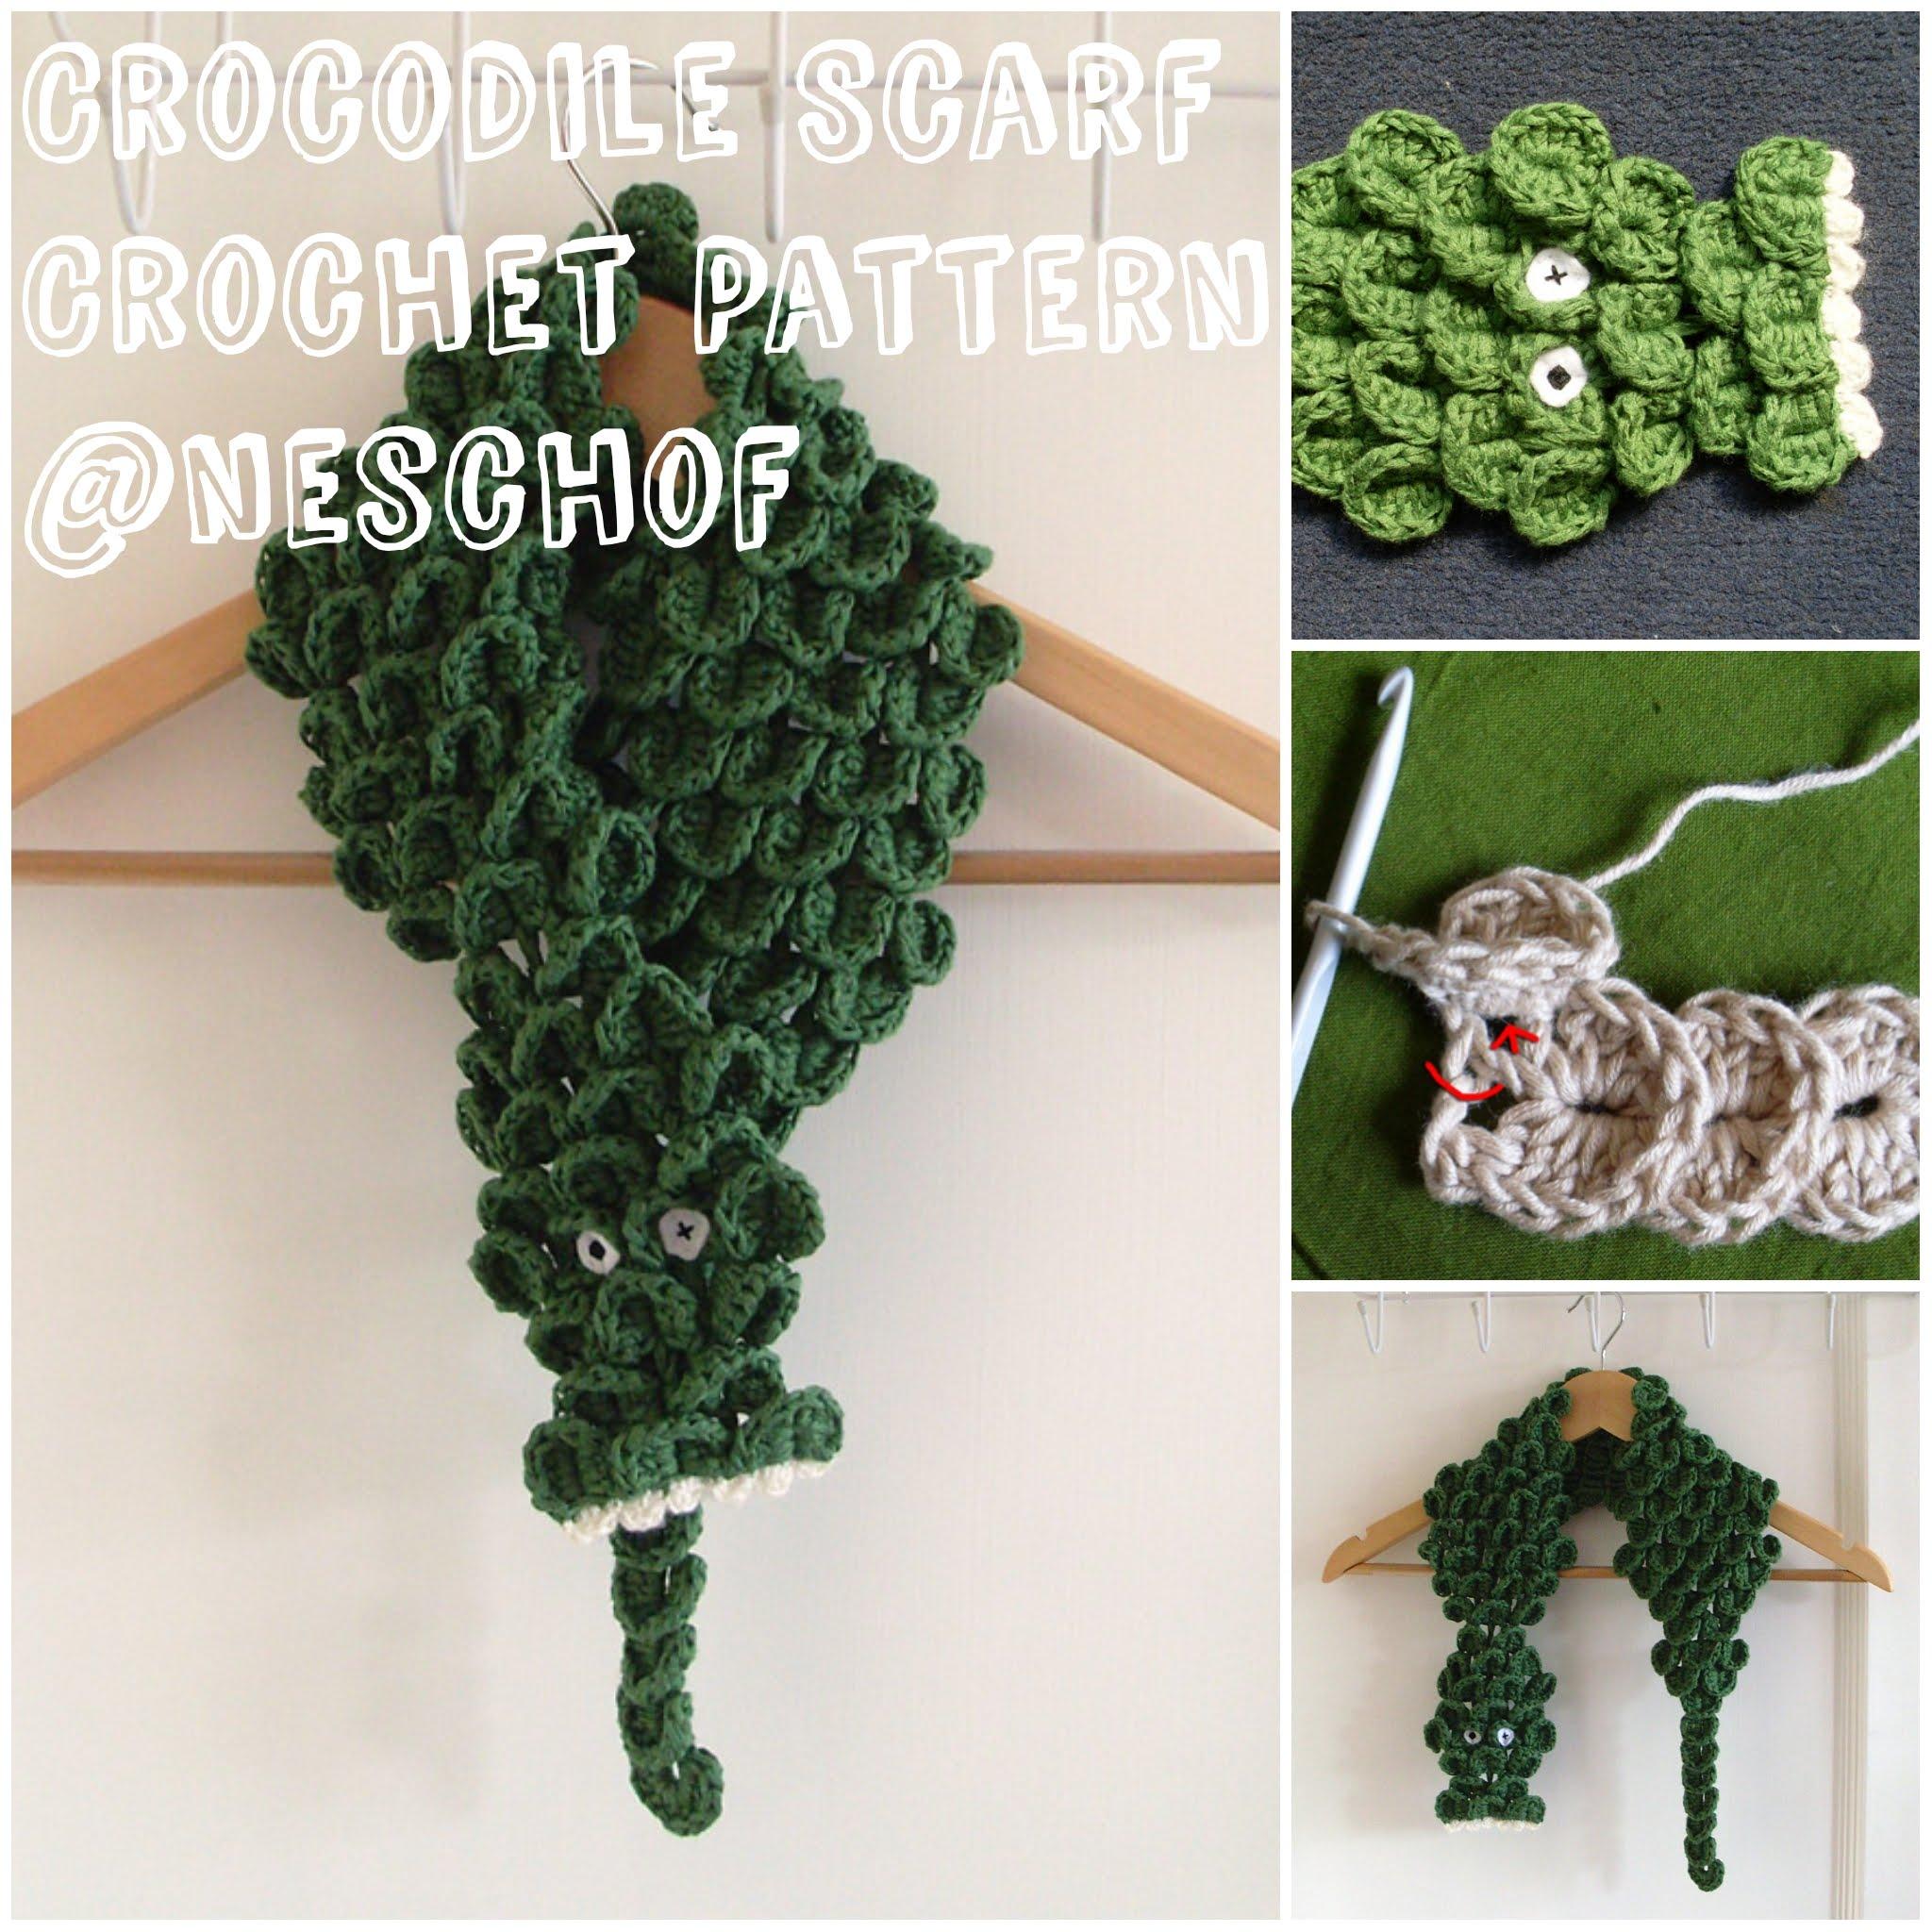 crocodile_scarf_crochet_neschof